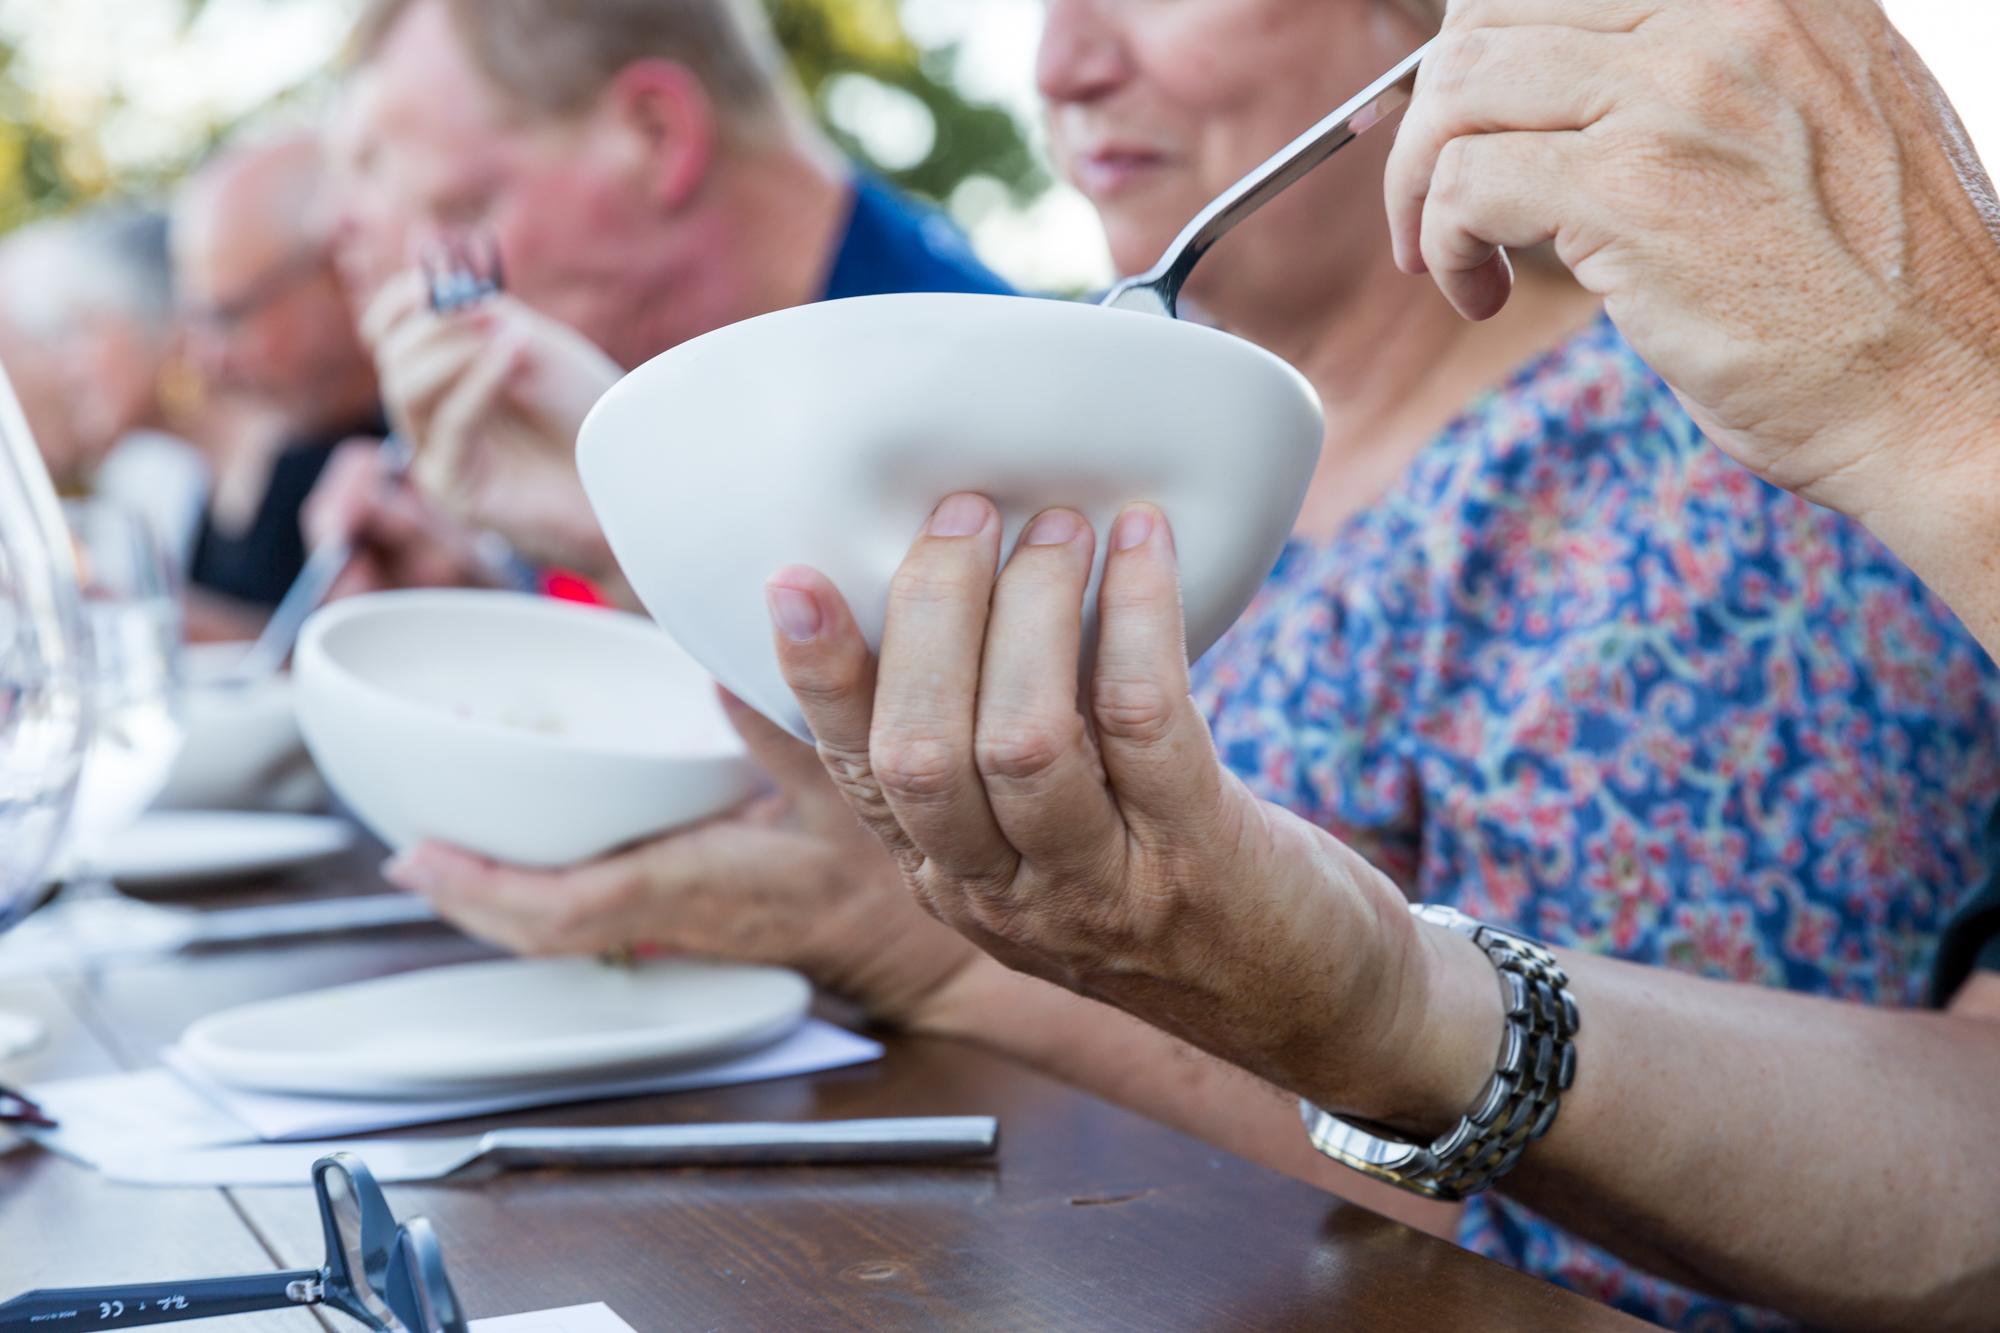 c stoll soter ipnc 2018 luscious porcelain divot bowl handmade.jpg